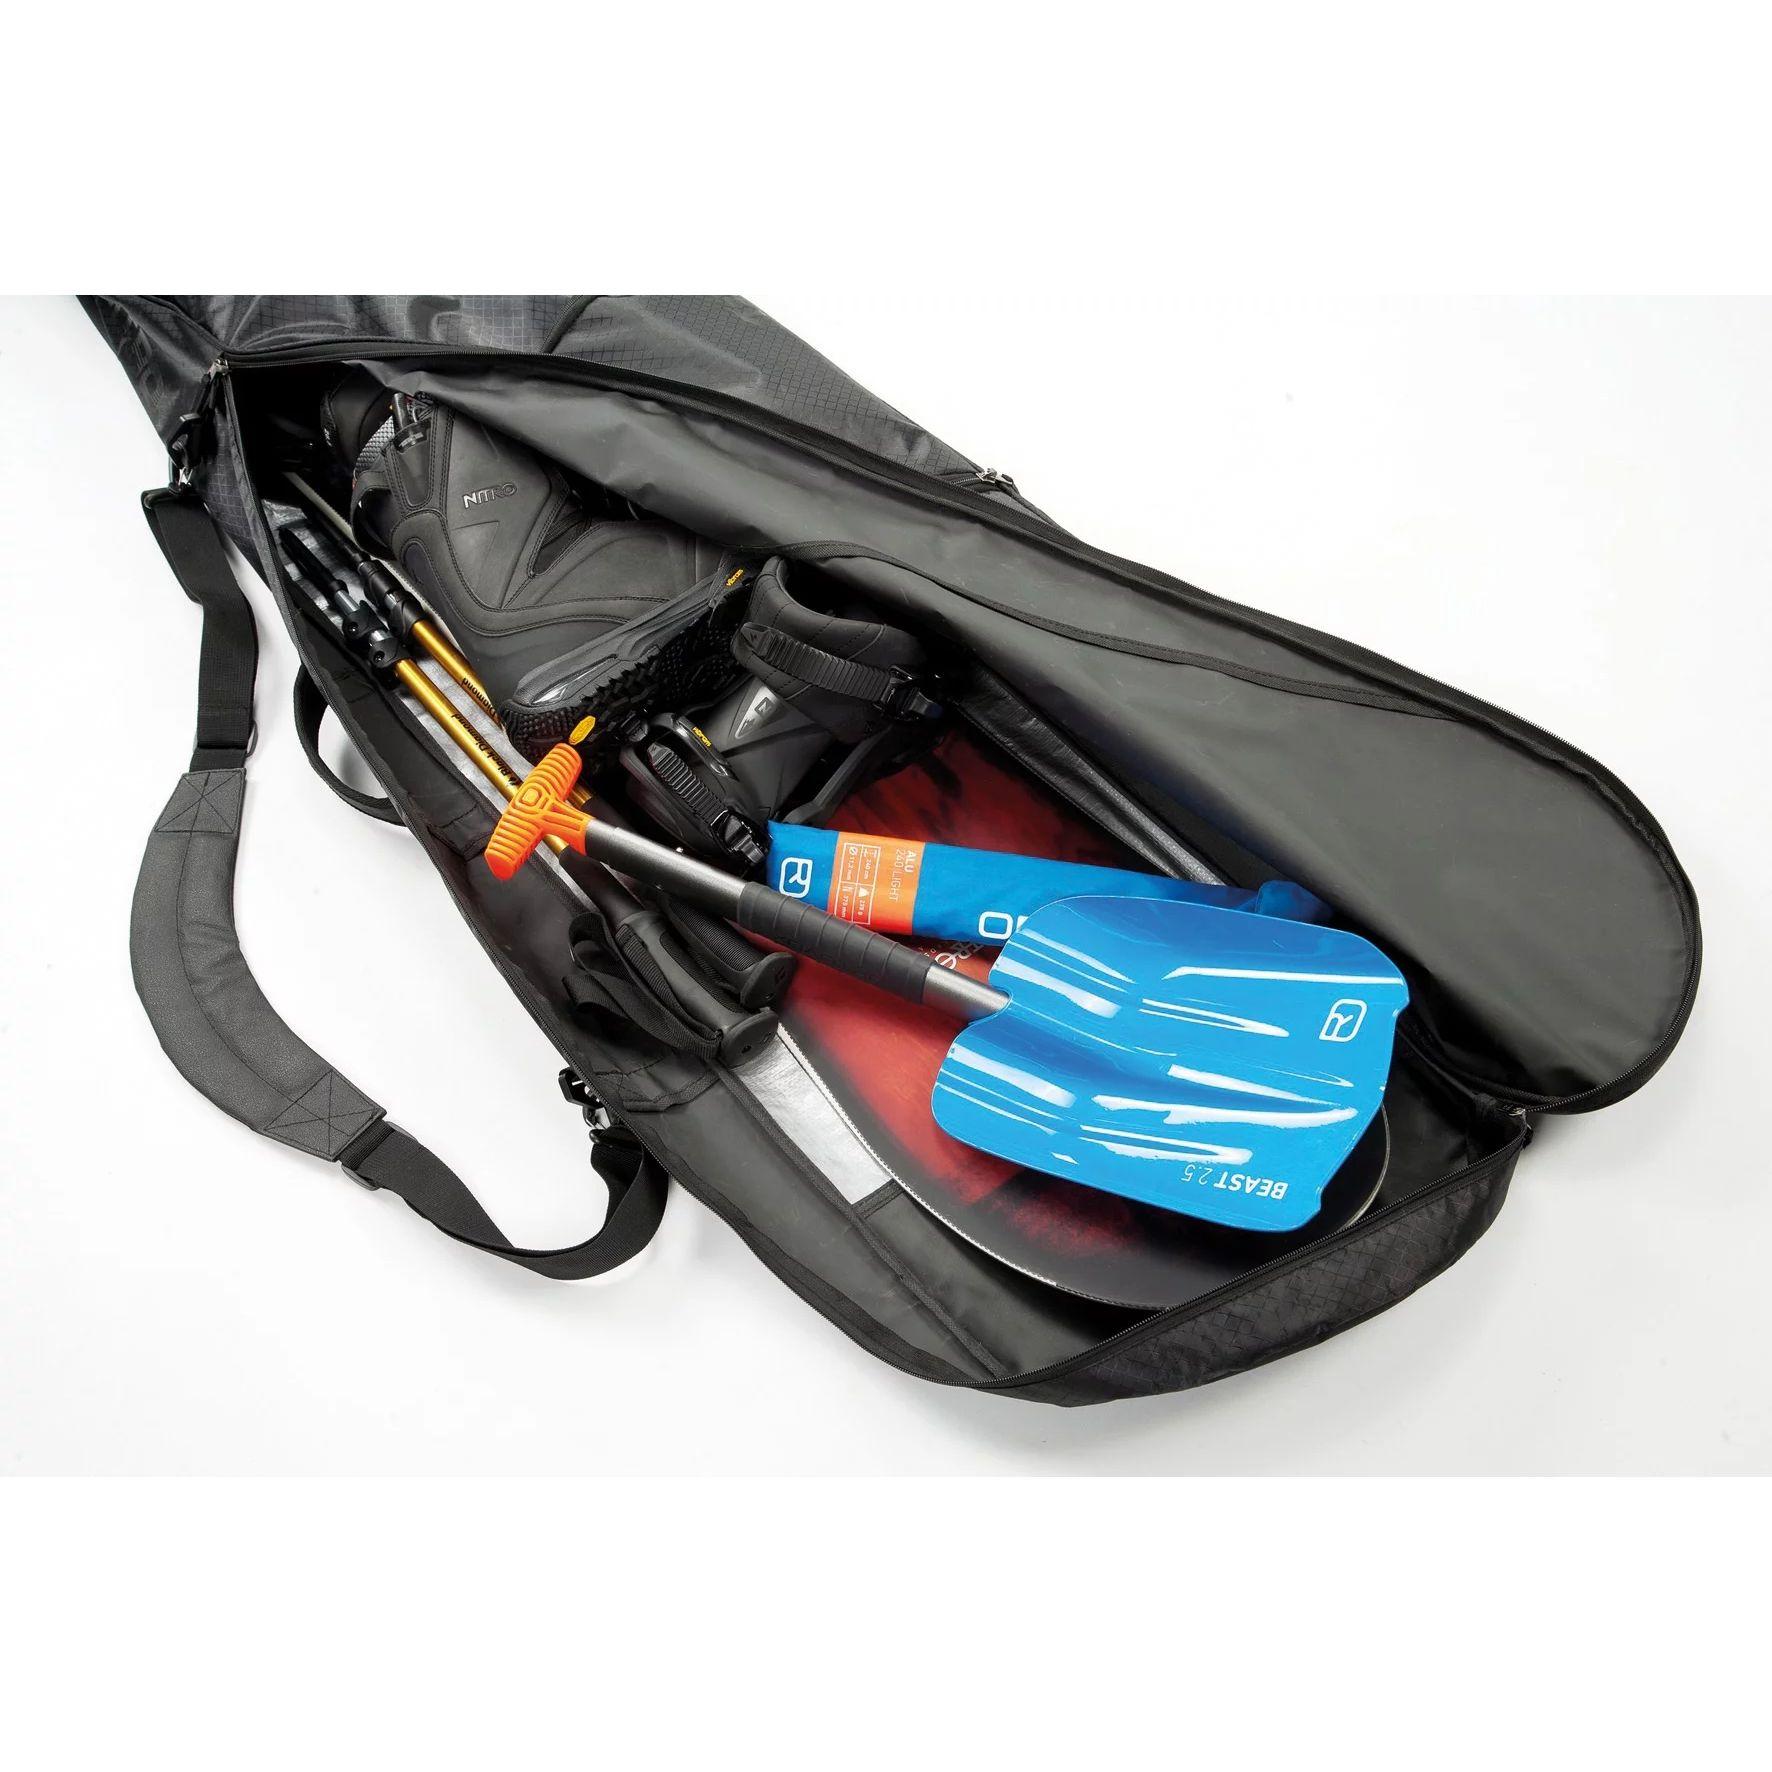 Bags -  nitro Sub Board Bag 165